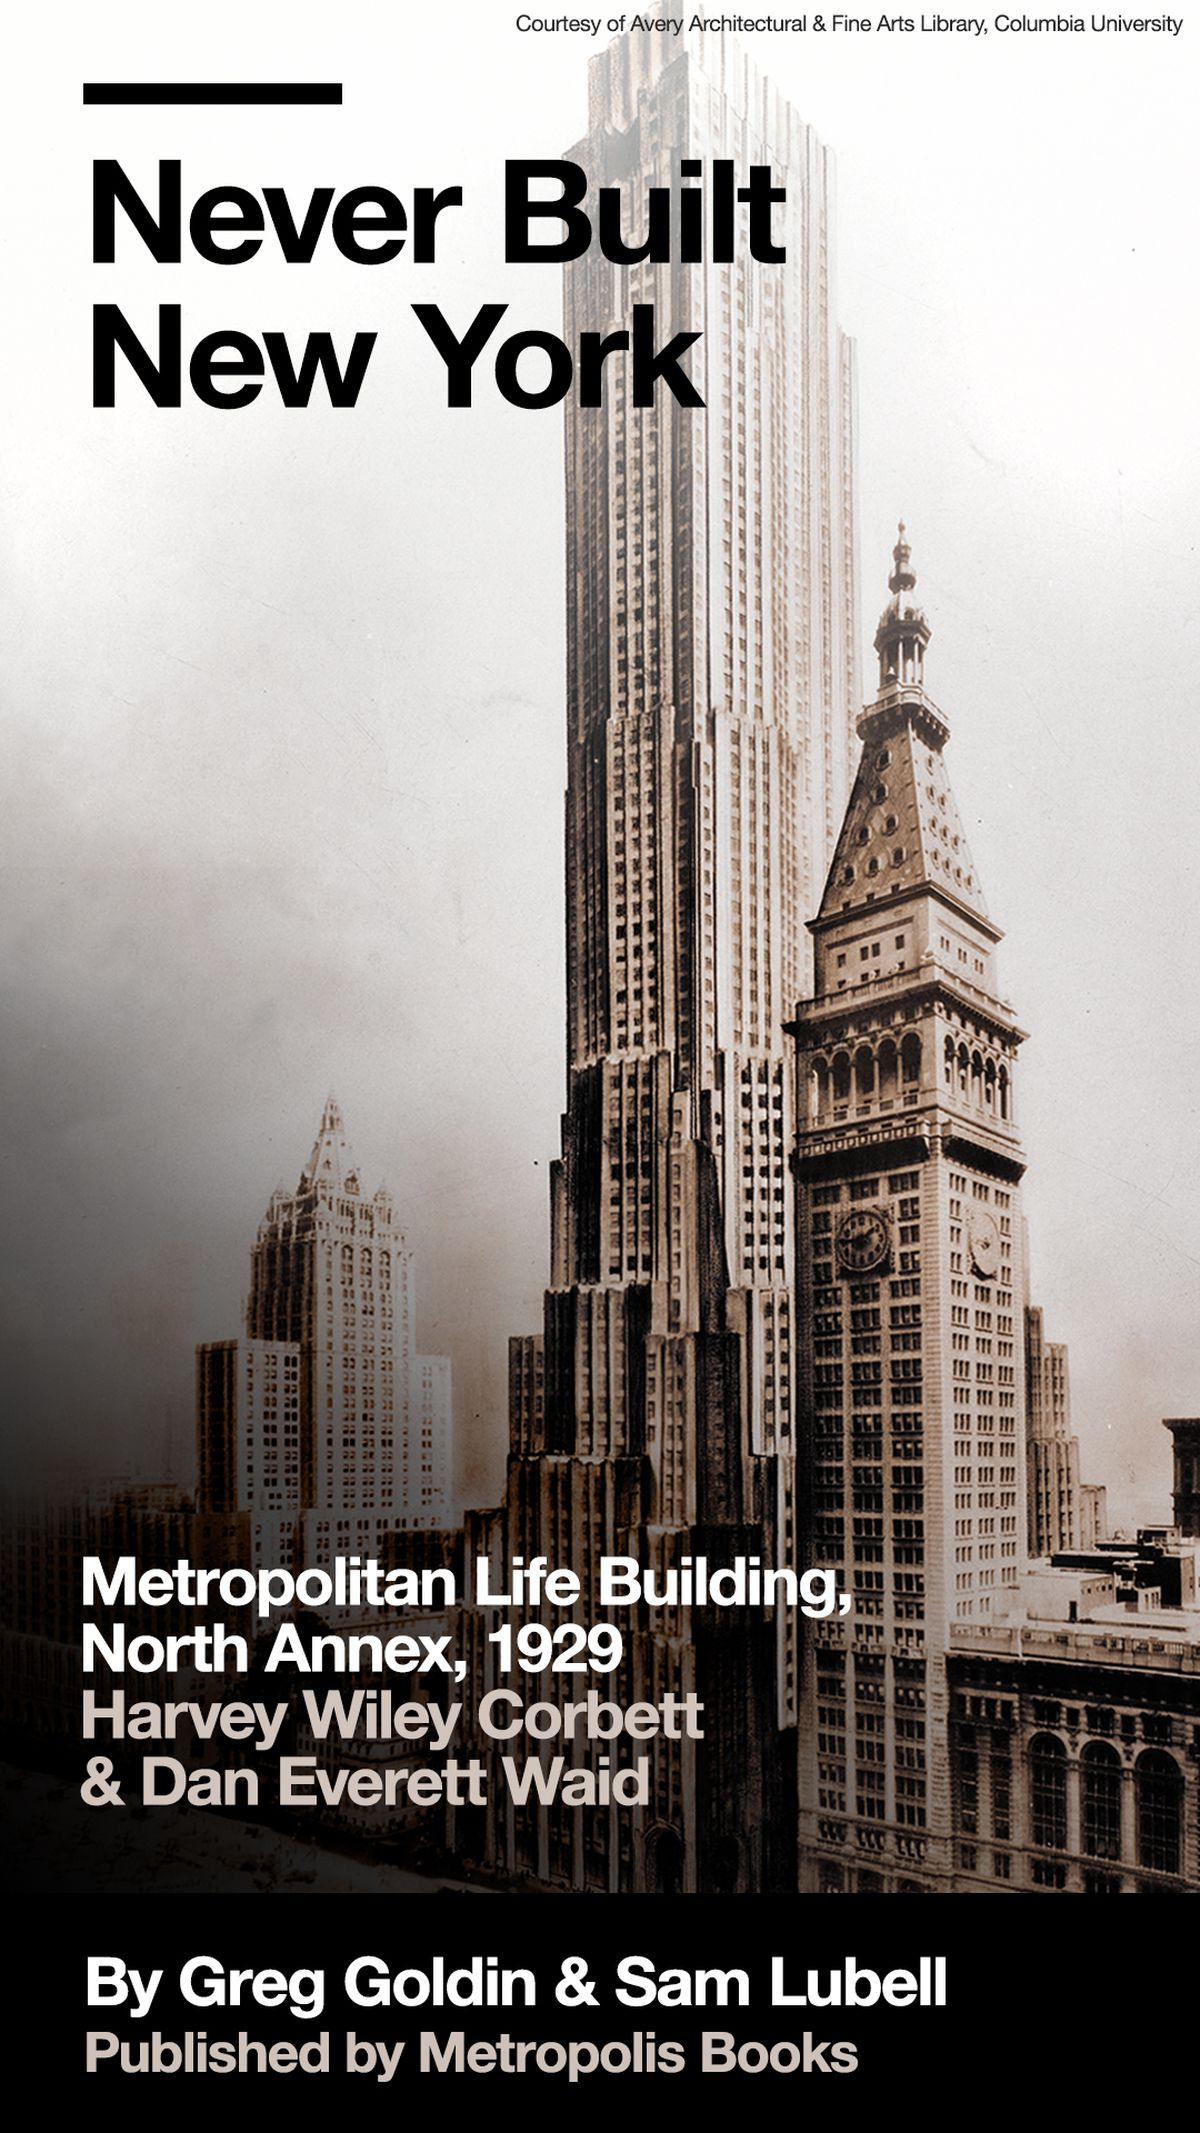 LinkNYC kiosks will display fantastical, never-built NYC ...